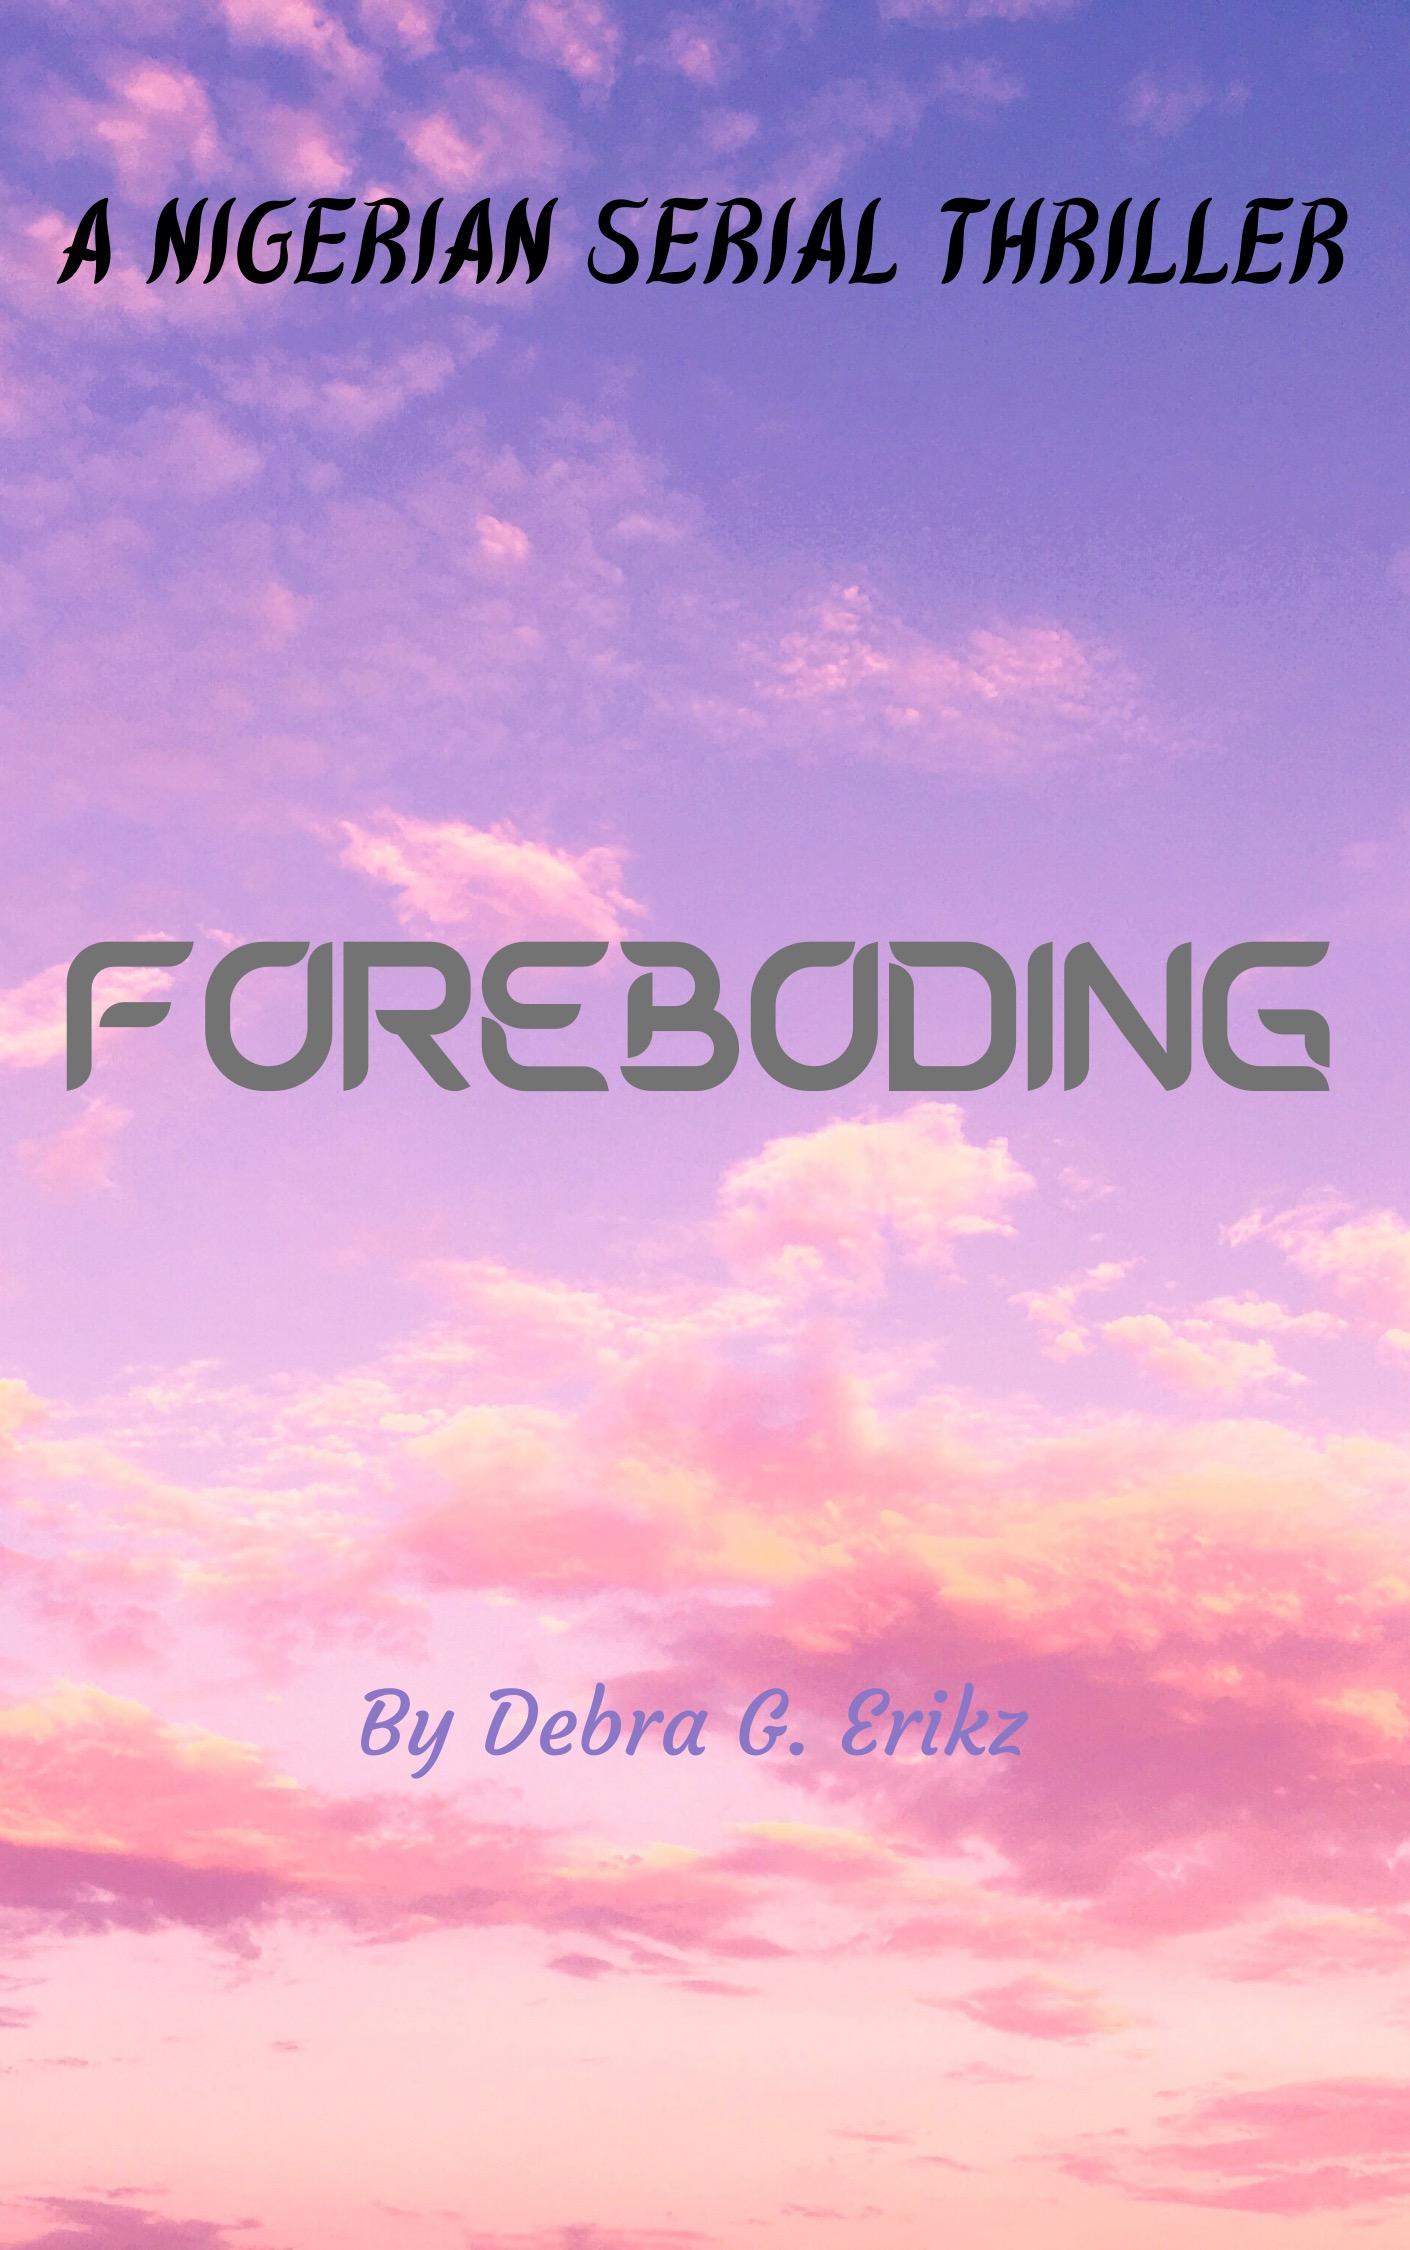 FOREBODING